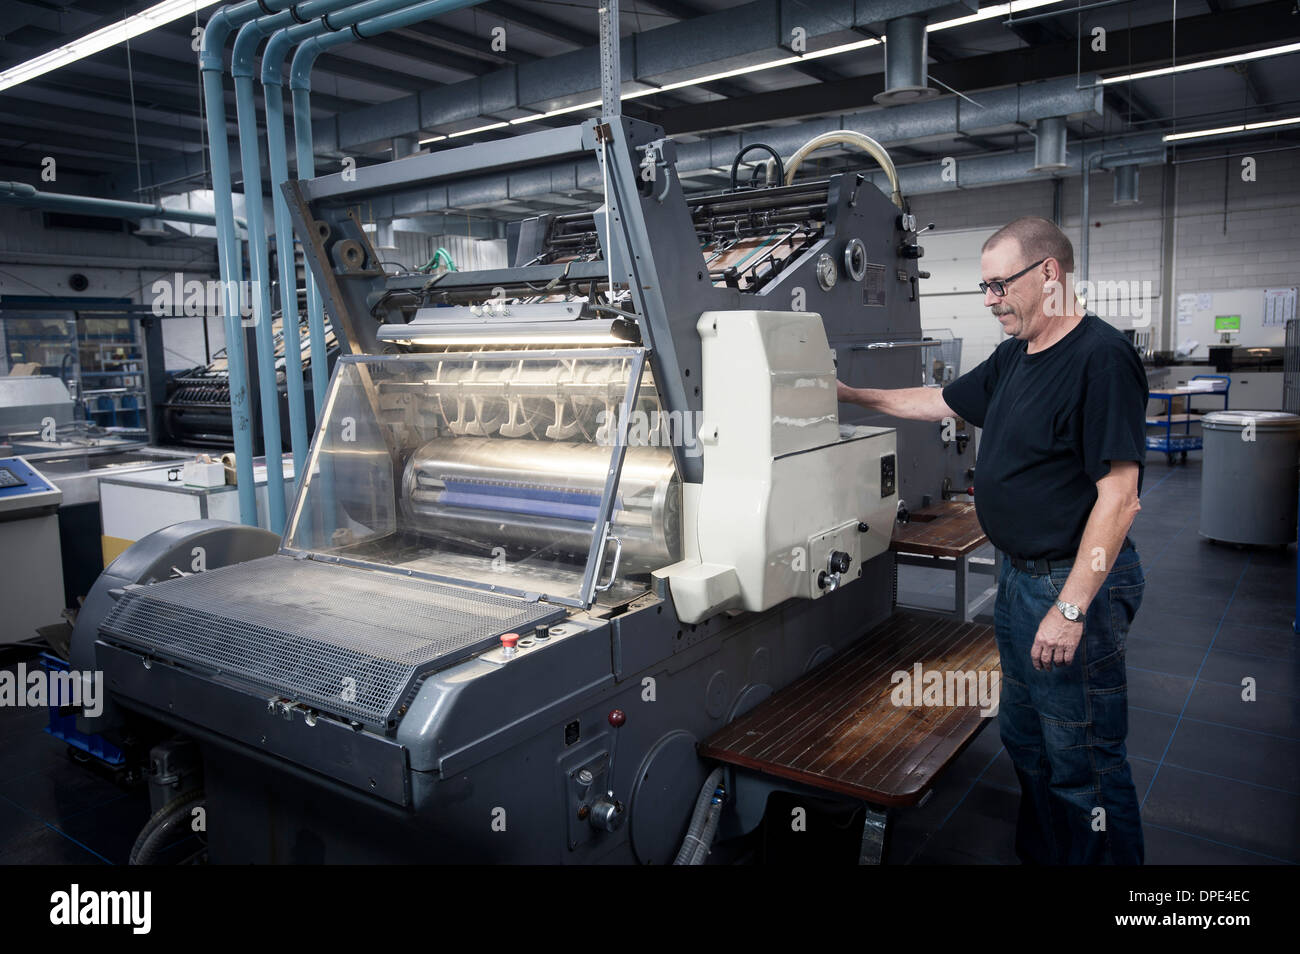 Worker operating print machine in printing workshop - Stock Image